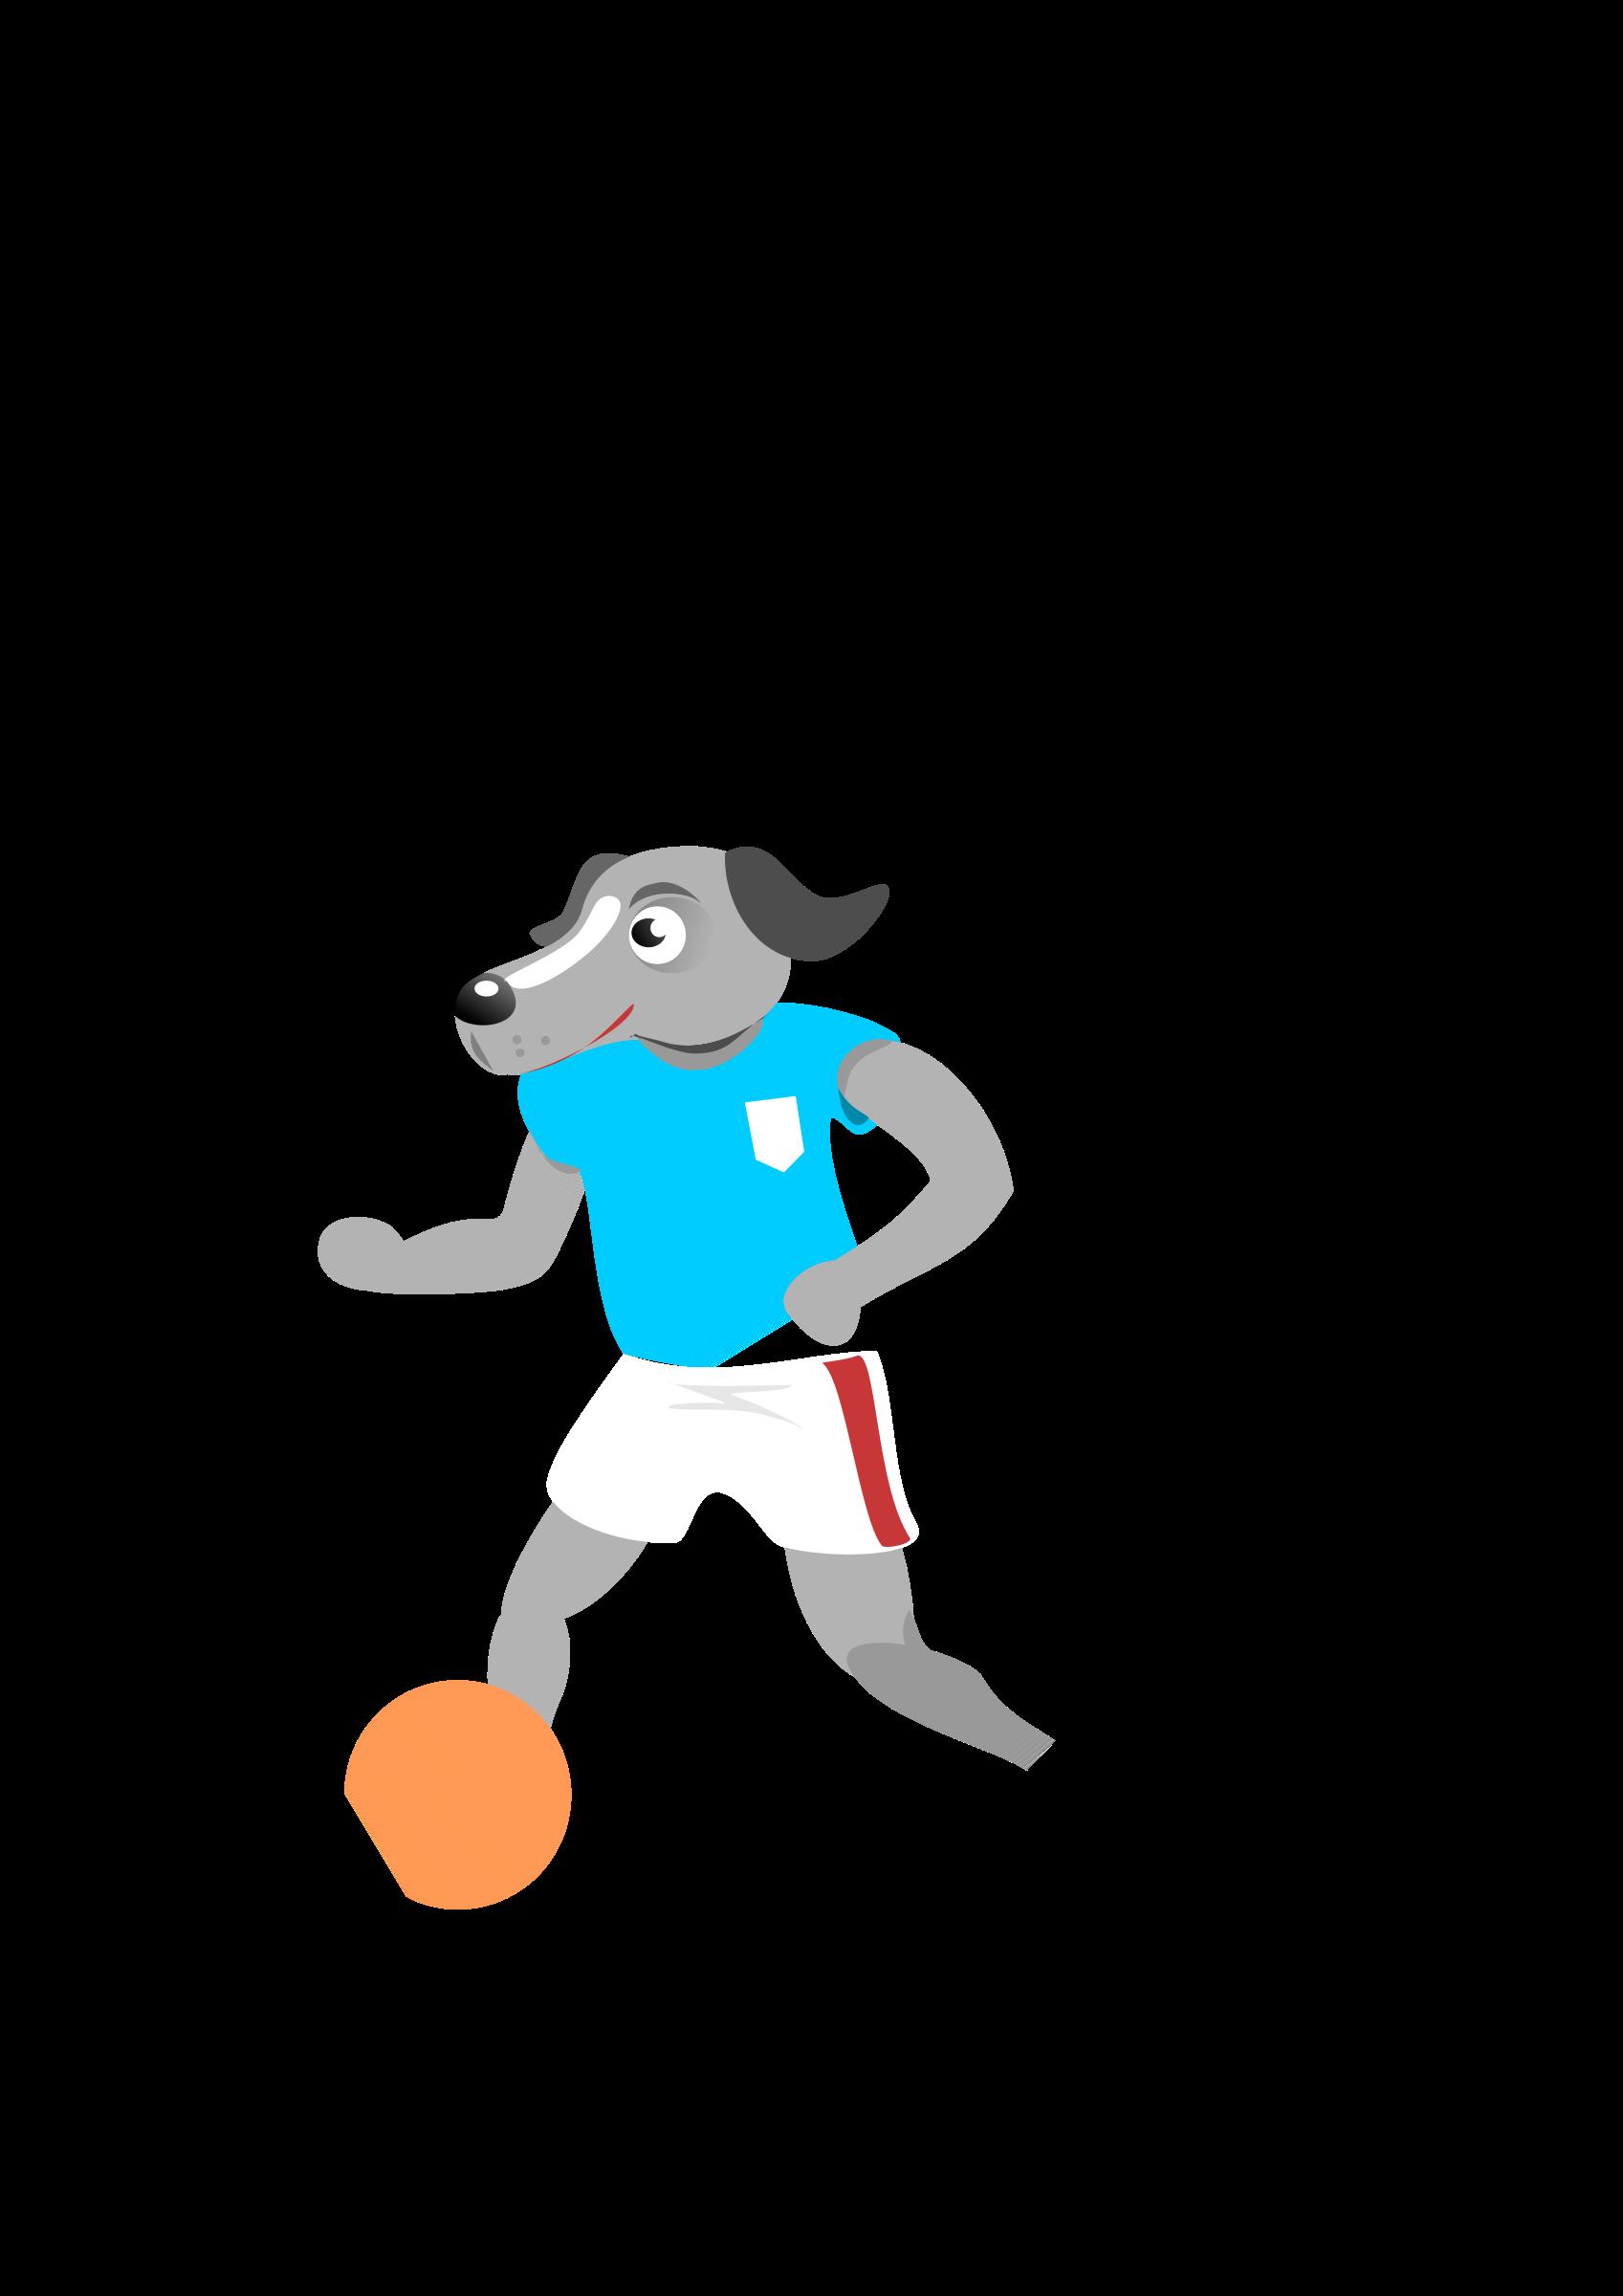 Clipart dog football. Soccer big image png